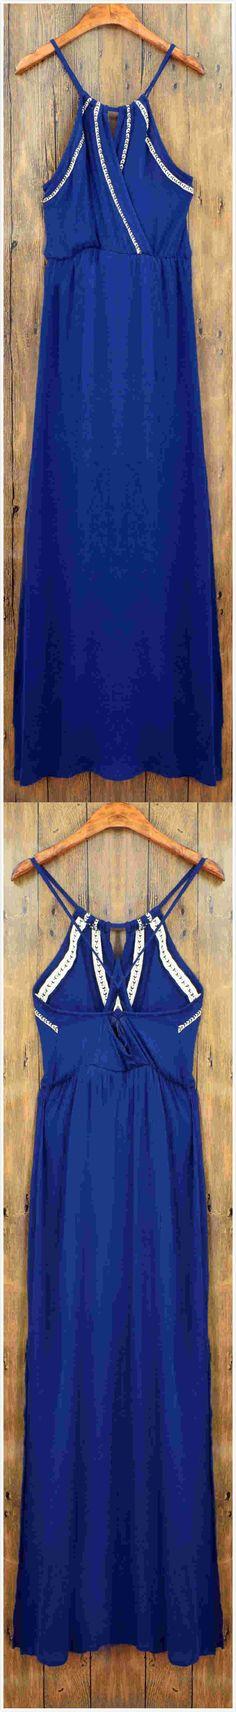 Women's Spaghetti Strap Cross Back Side Slit Maxi Dress.Check more from www.oasap.com .